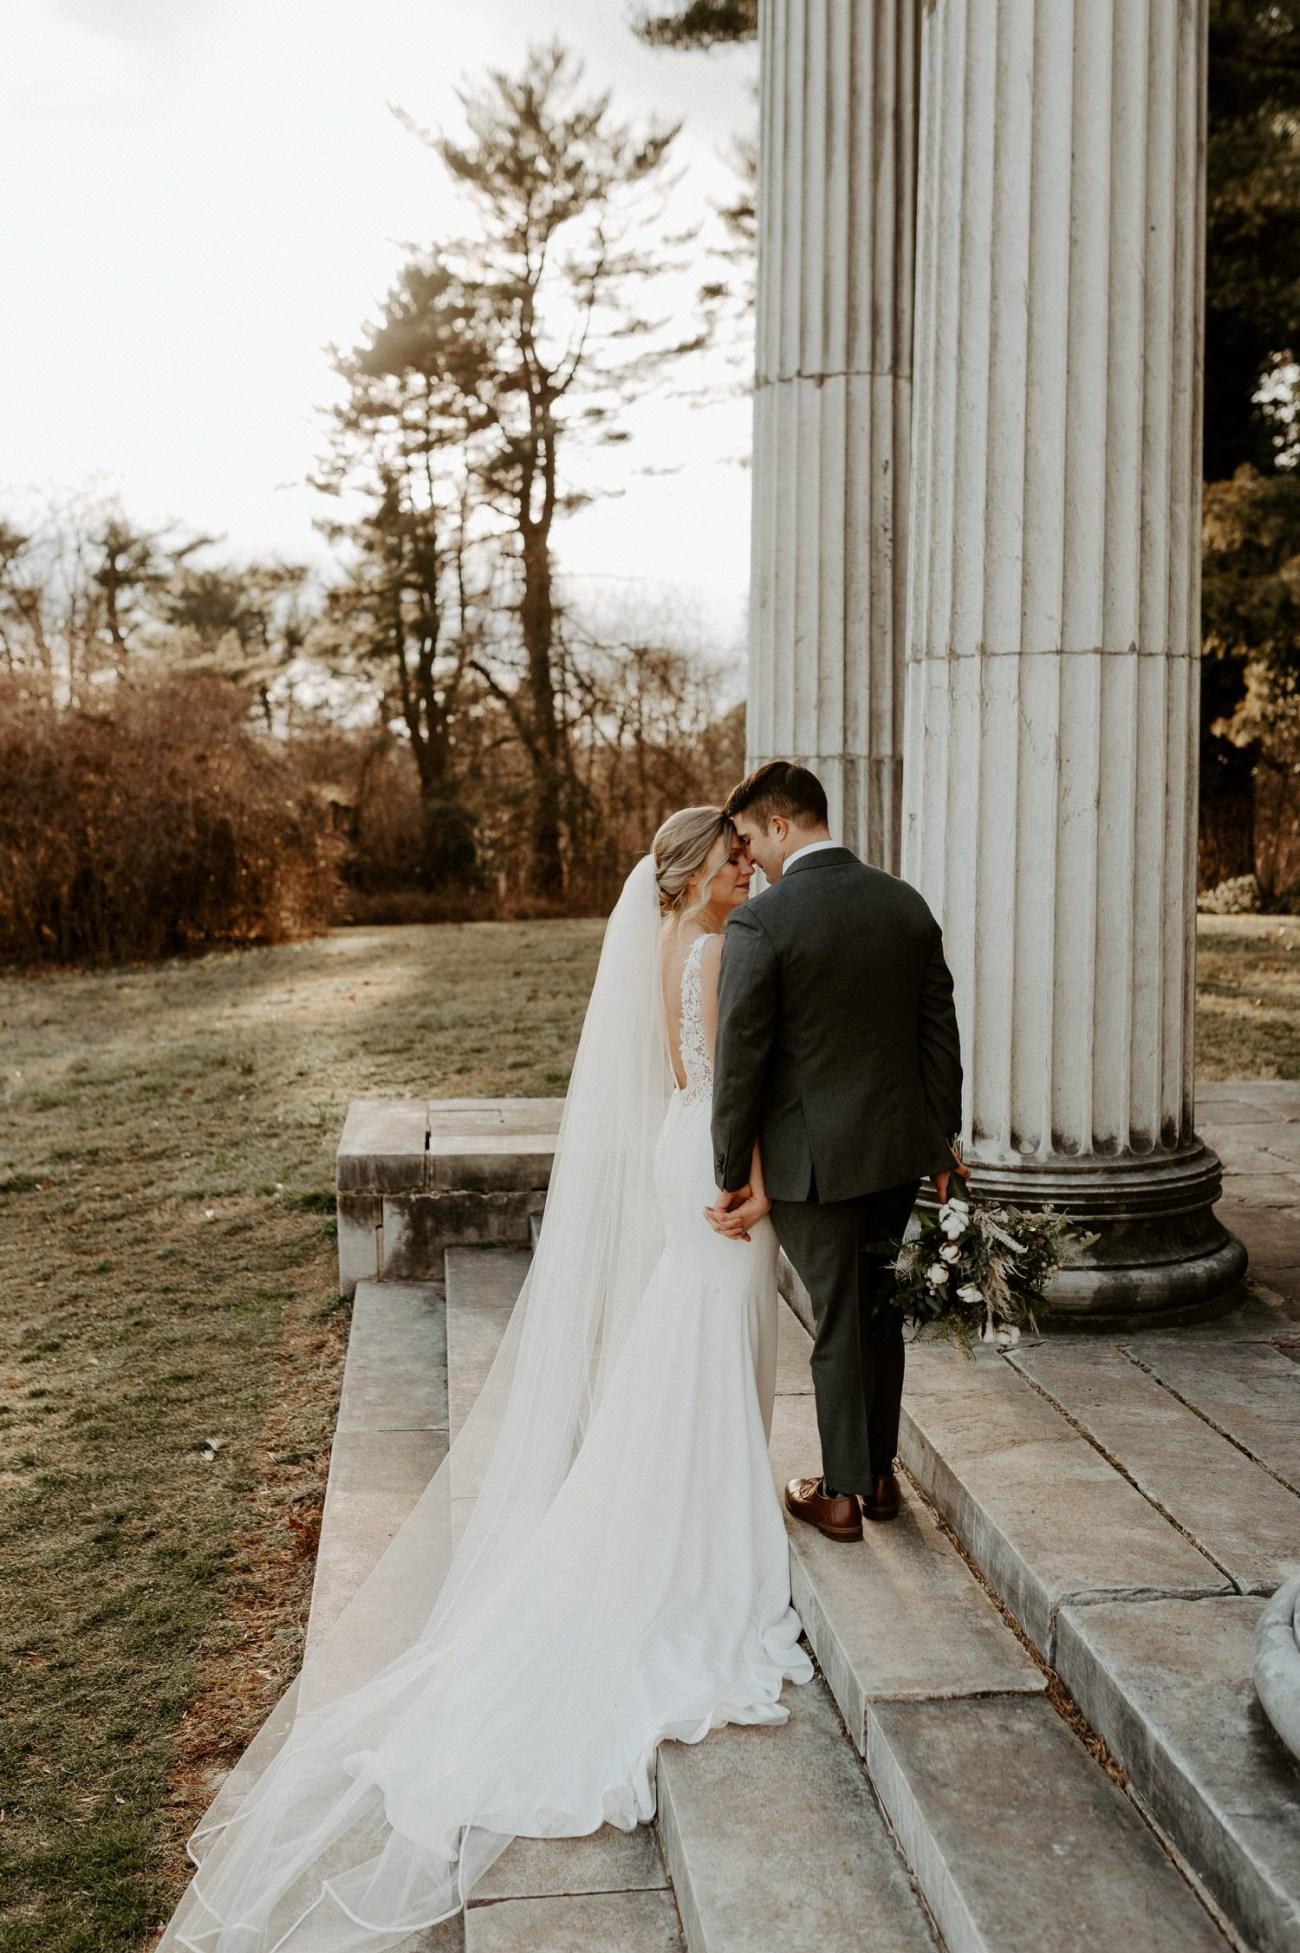 Princeton Battlefield Wedding Princeton University Elopement New Jersey Wedding Photographer Anais Possamai Photography 36